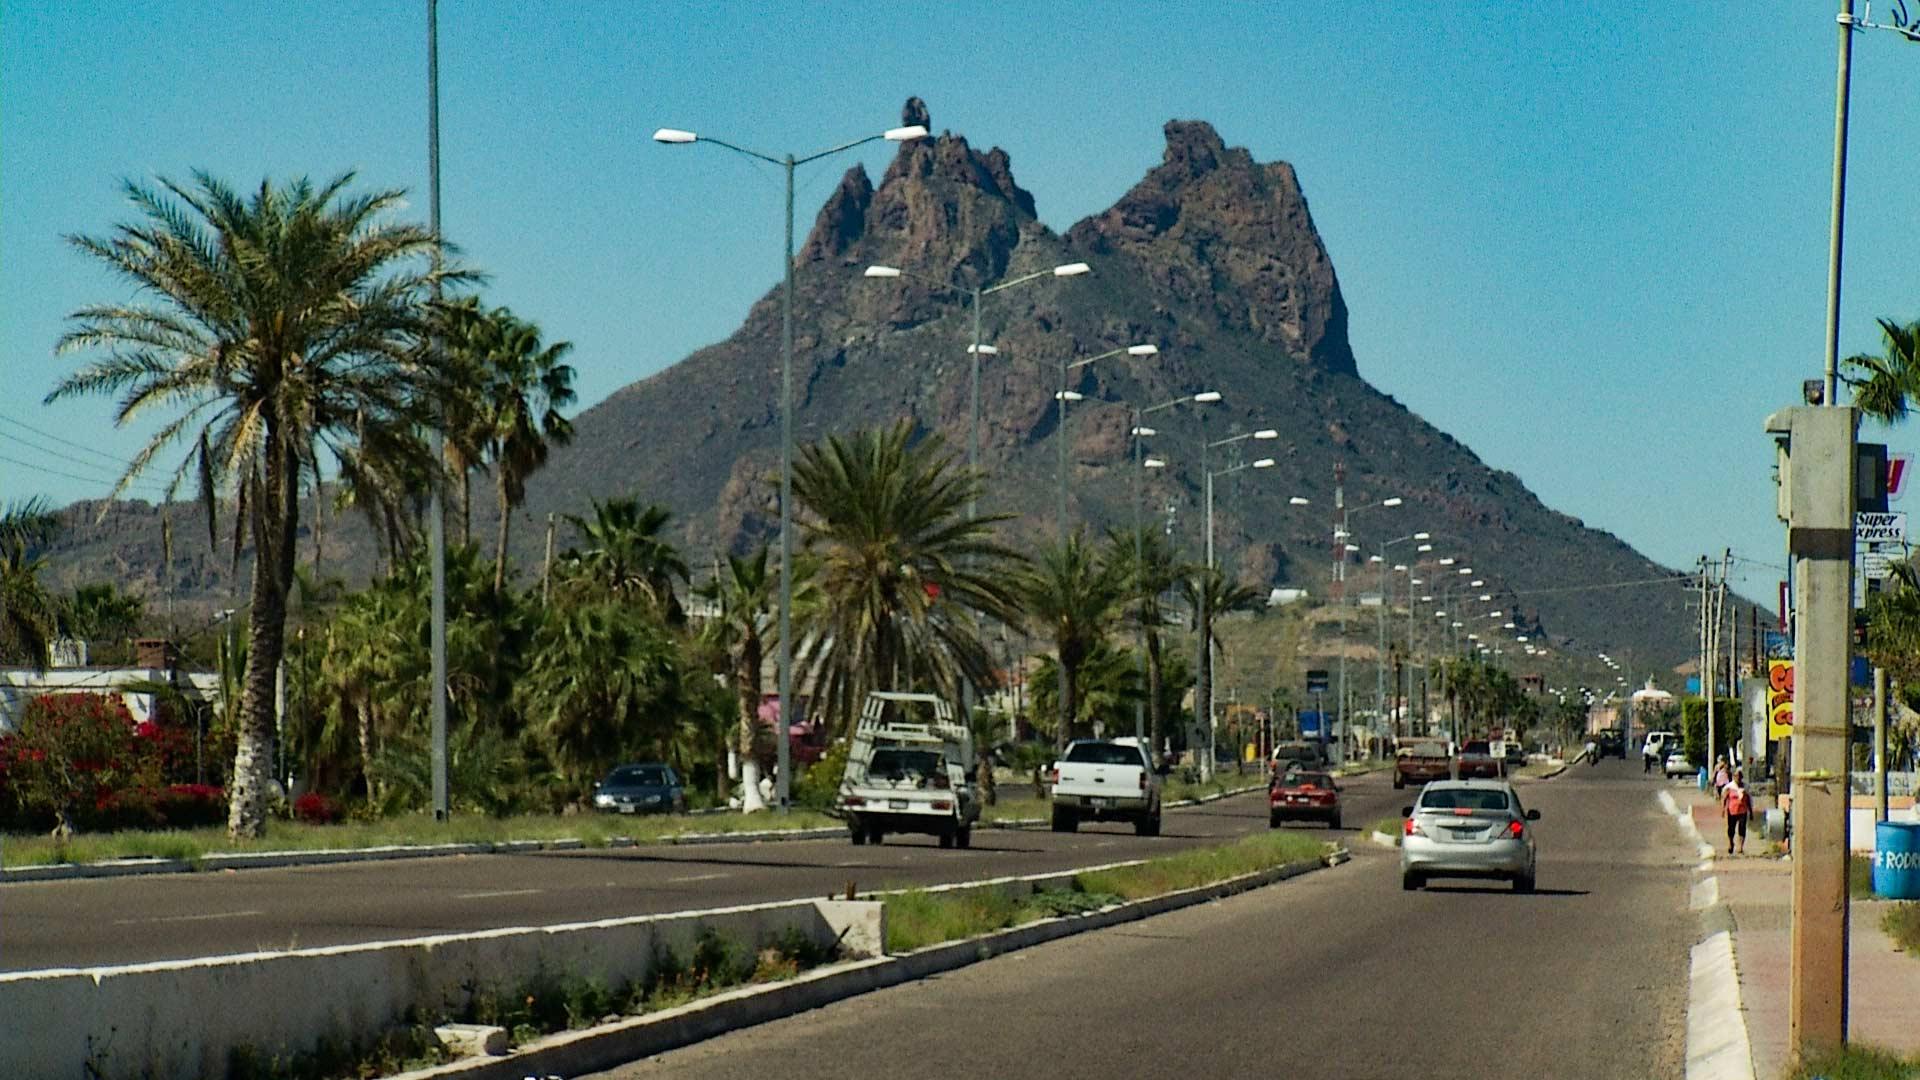 A street in San Carlos, Sonora.